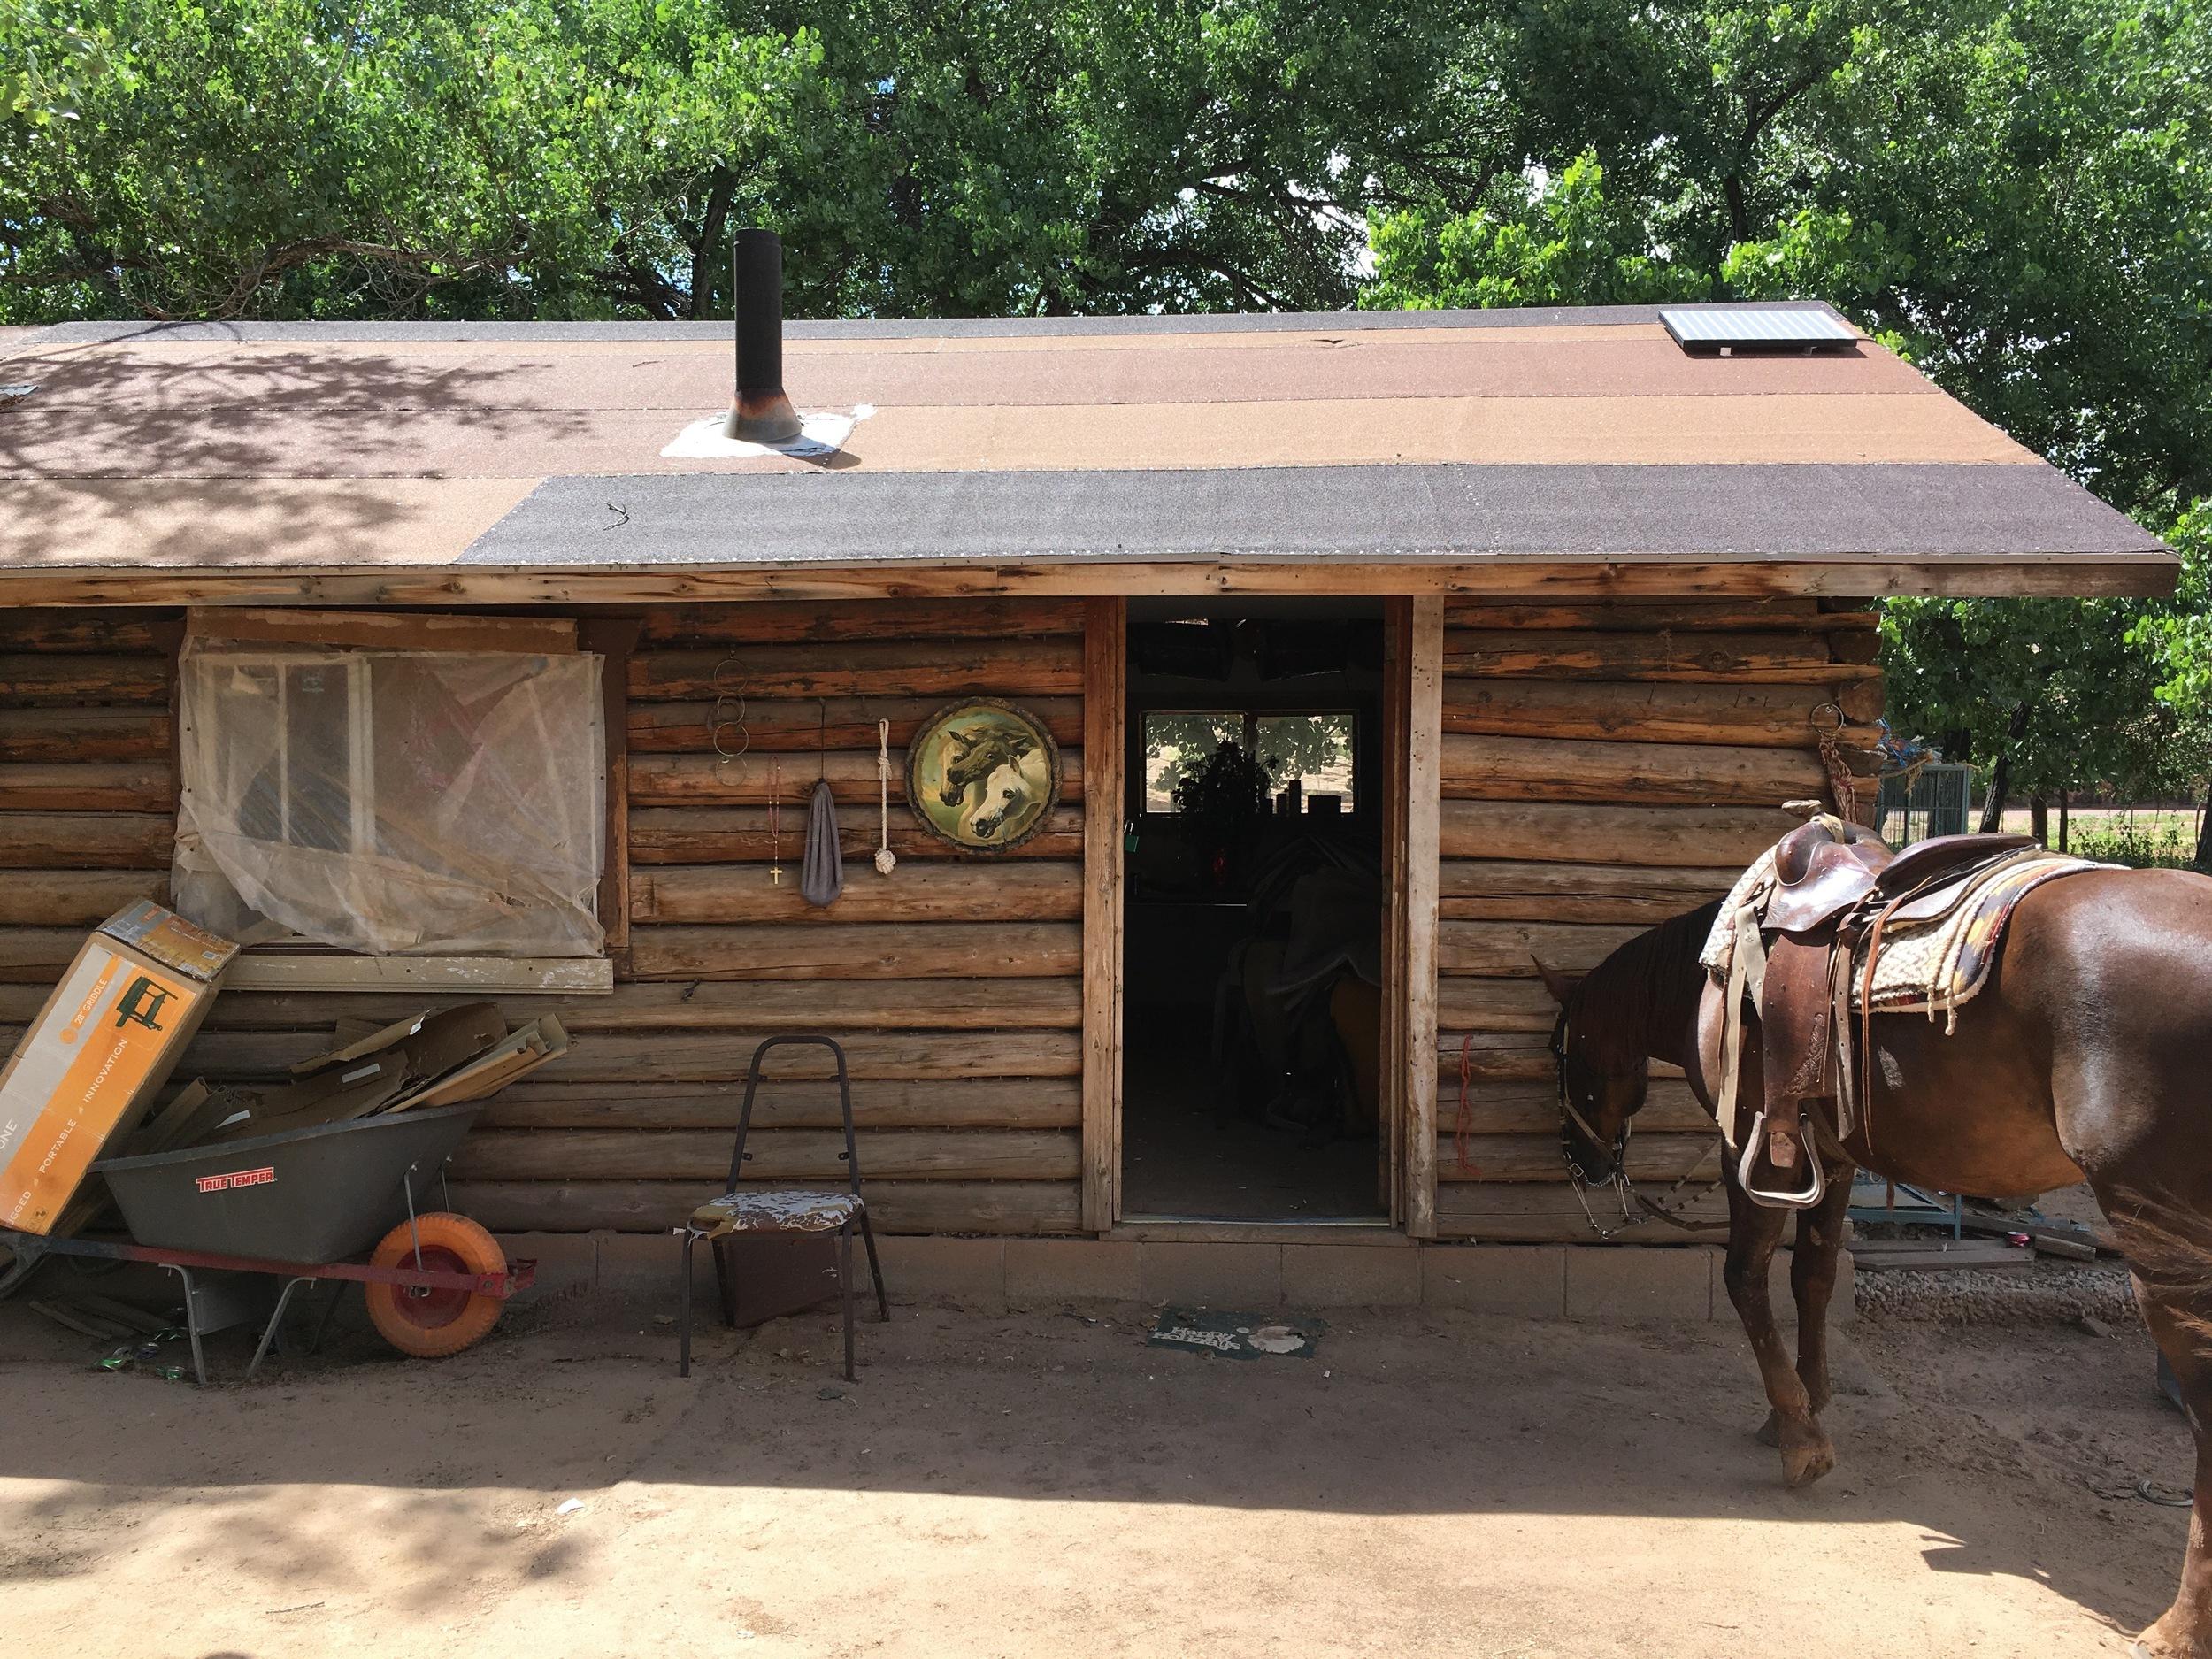 Justin's Horse Rental, Canyon de Chelly